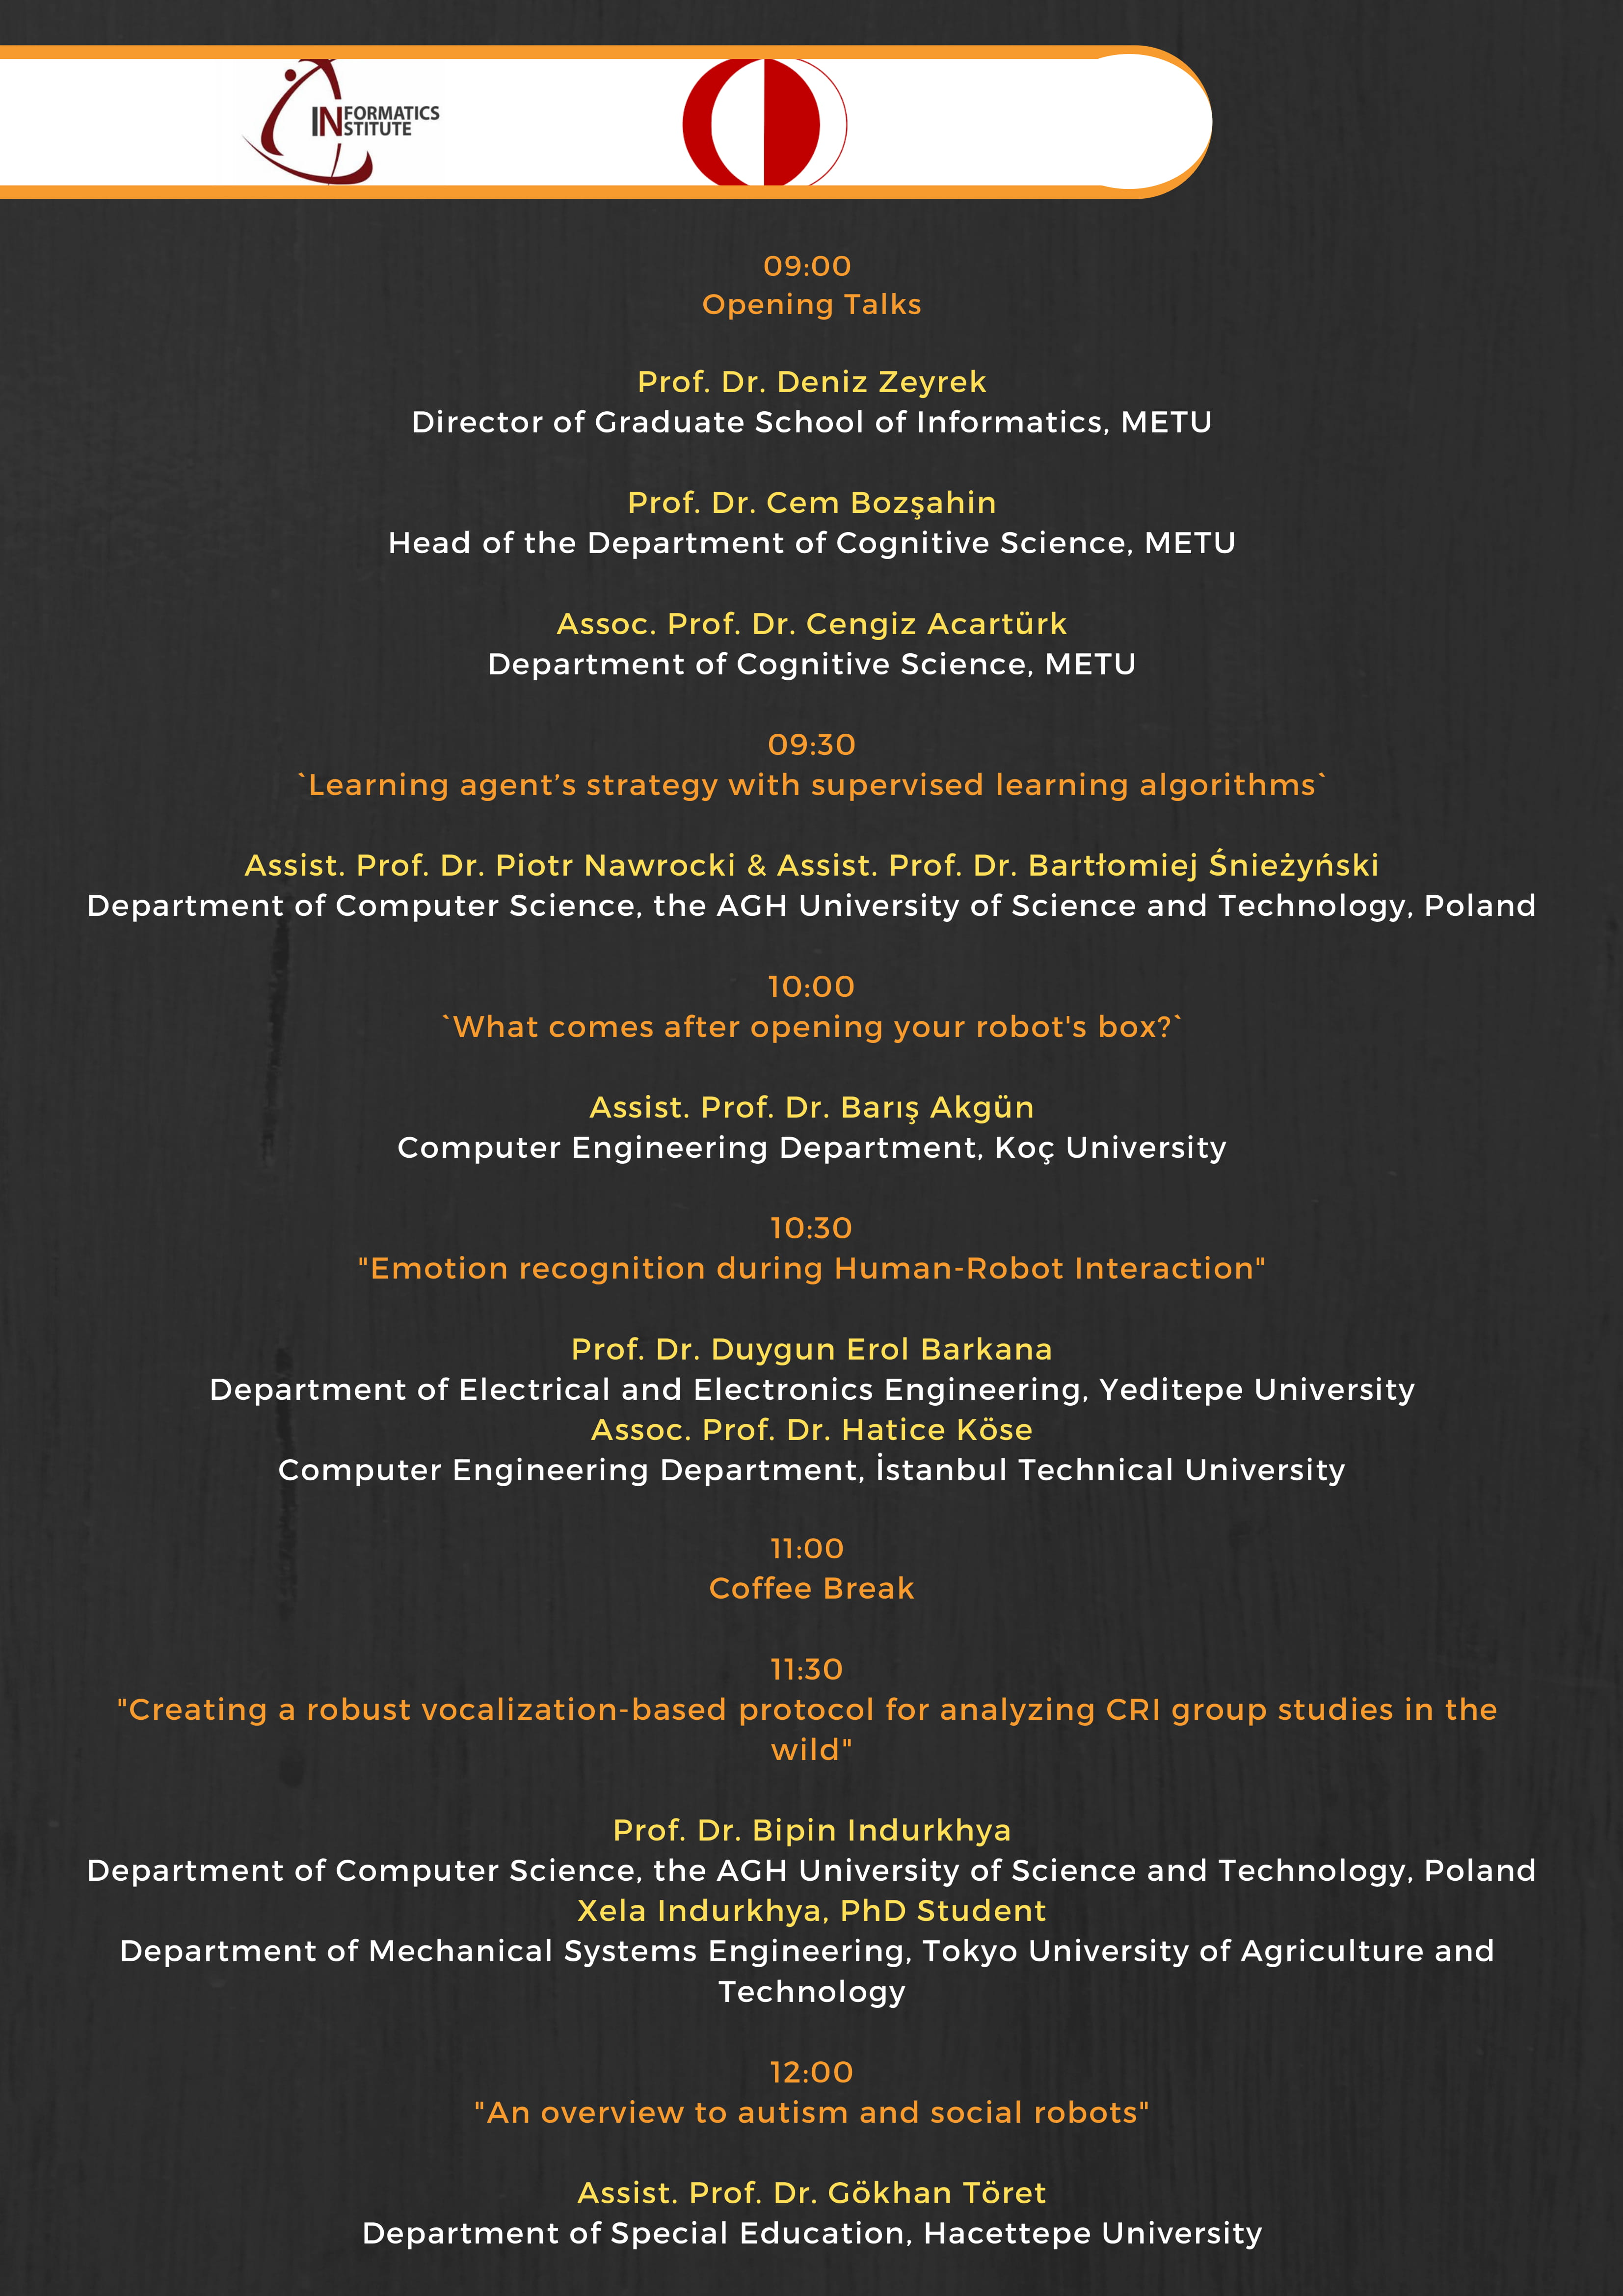 Symposium on Human-Robot Interaction, December 13 | Graduate School